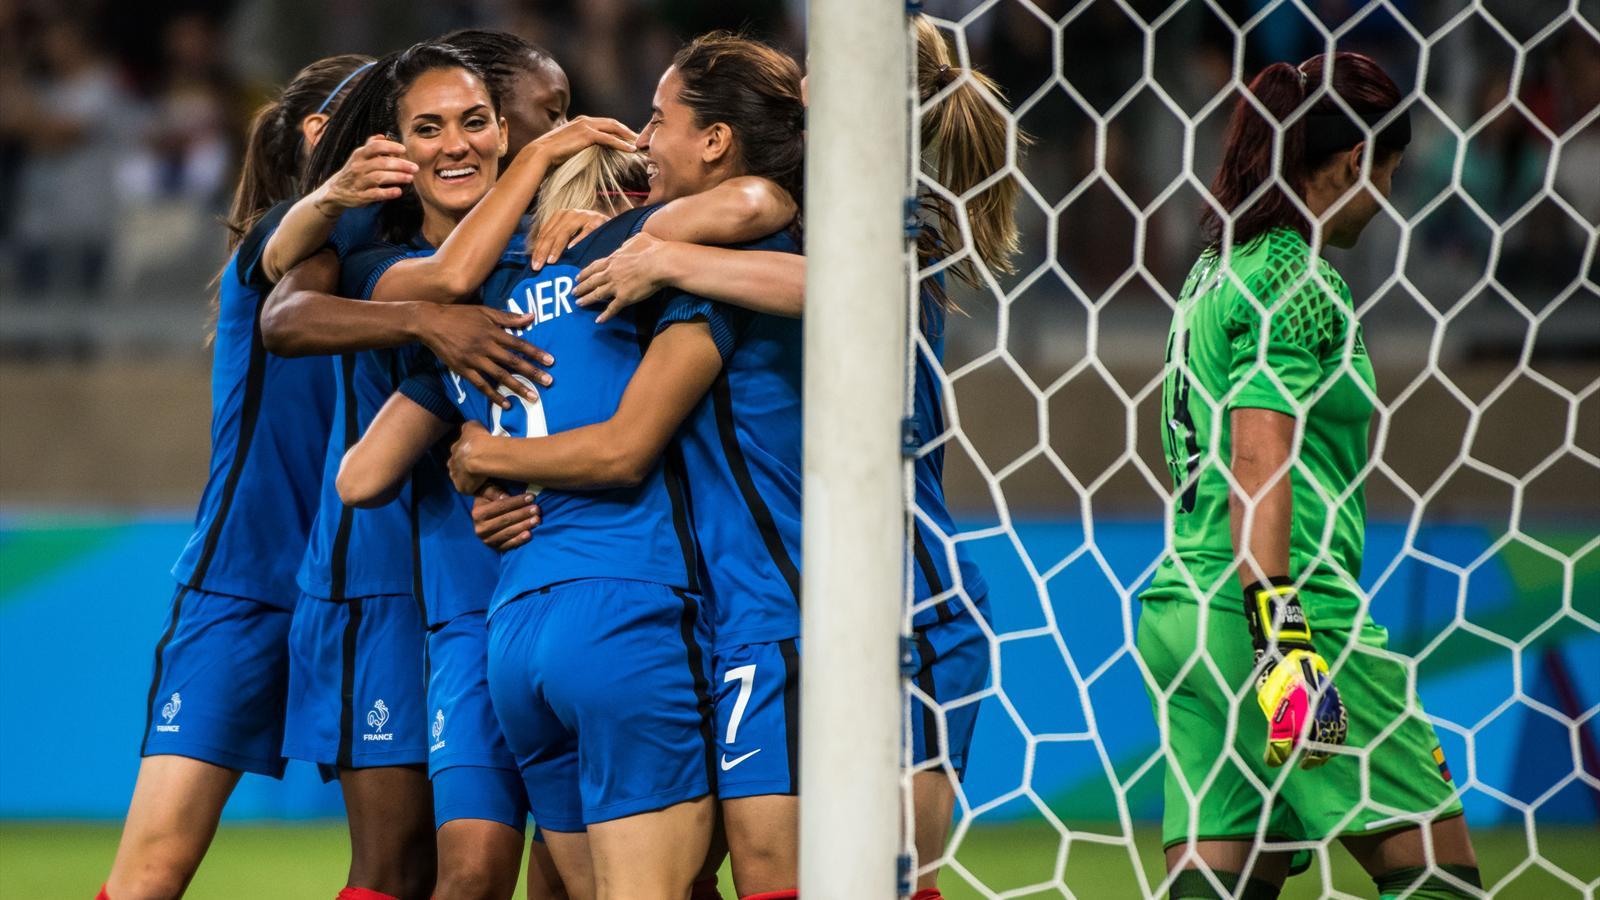 Championnat d europe de football f minin regardez en direct vid o l 39 euro f minin 2017 sur - Coupe d europe de basket feminin ...